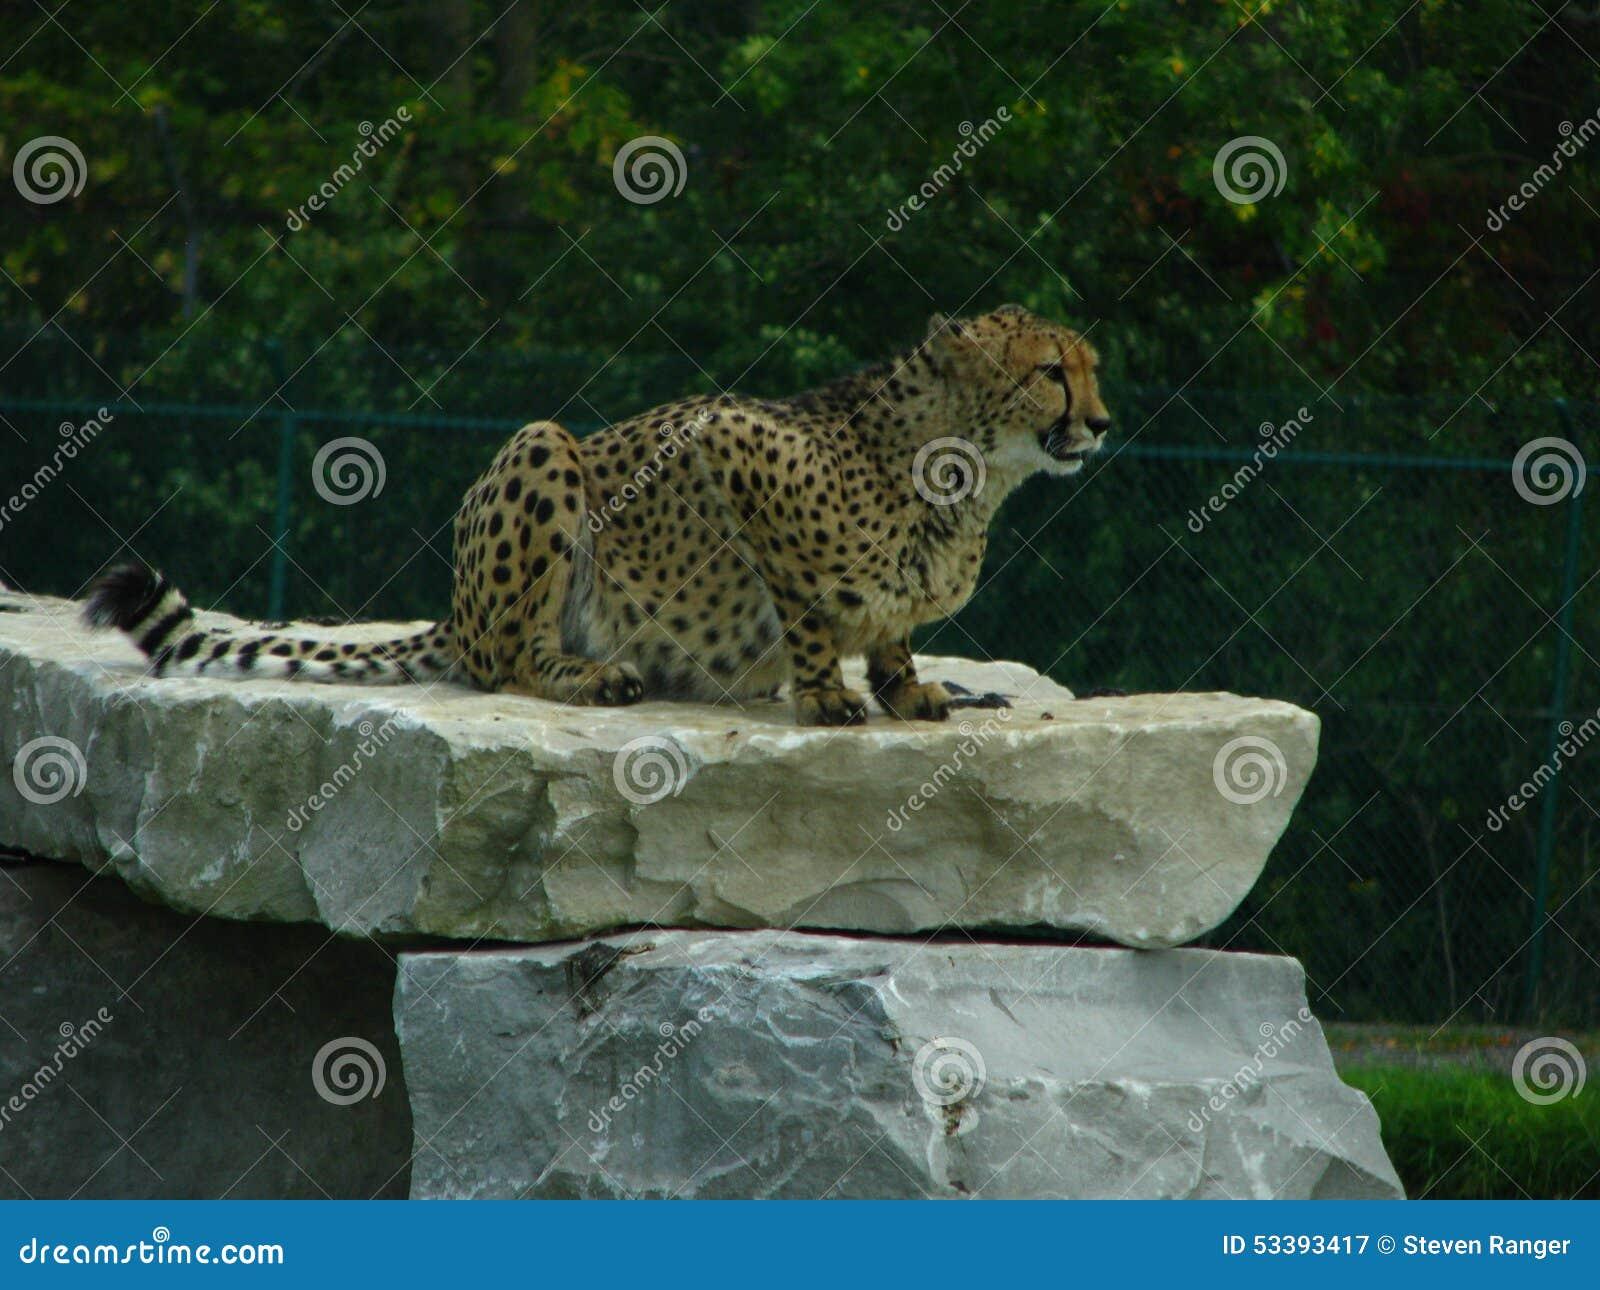 Cheetah sitting on a rock ledge